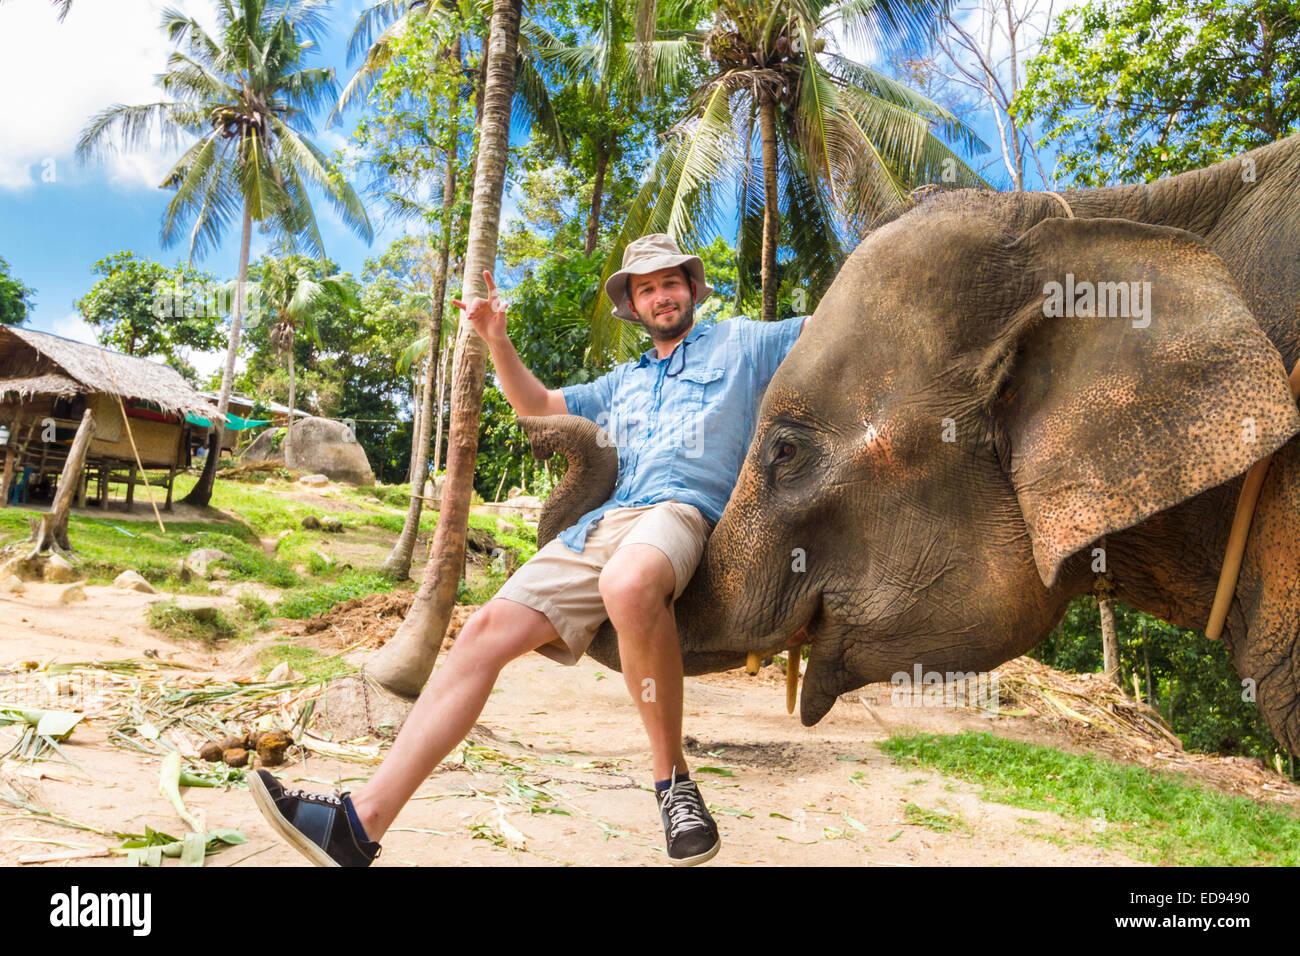 Elephan heben ein Tourist. Stockbild